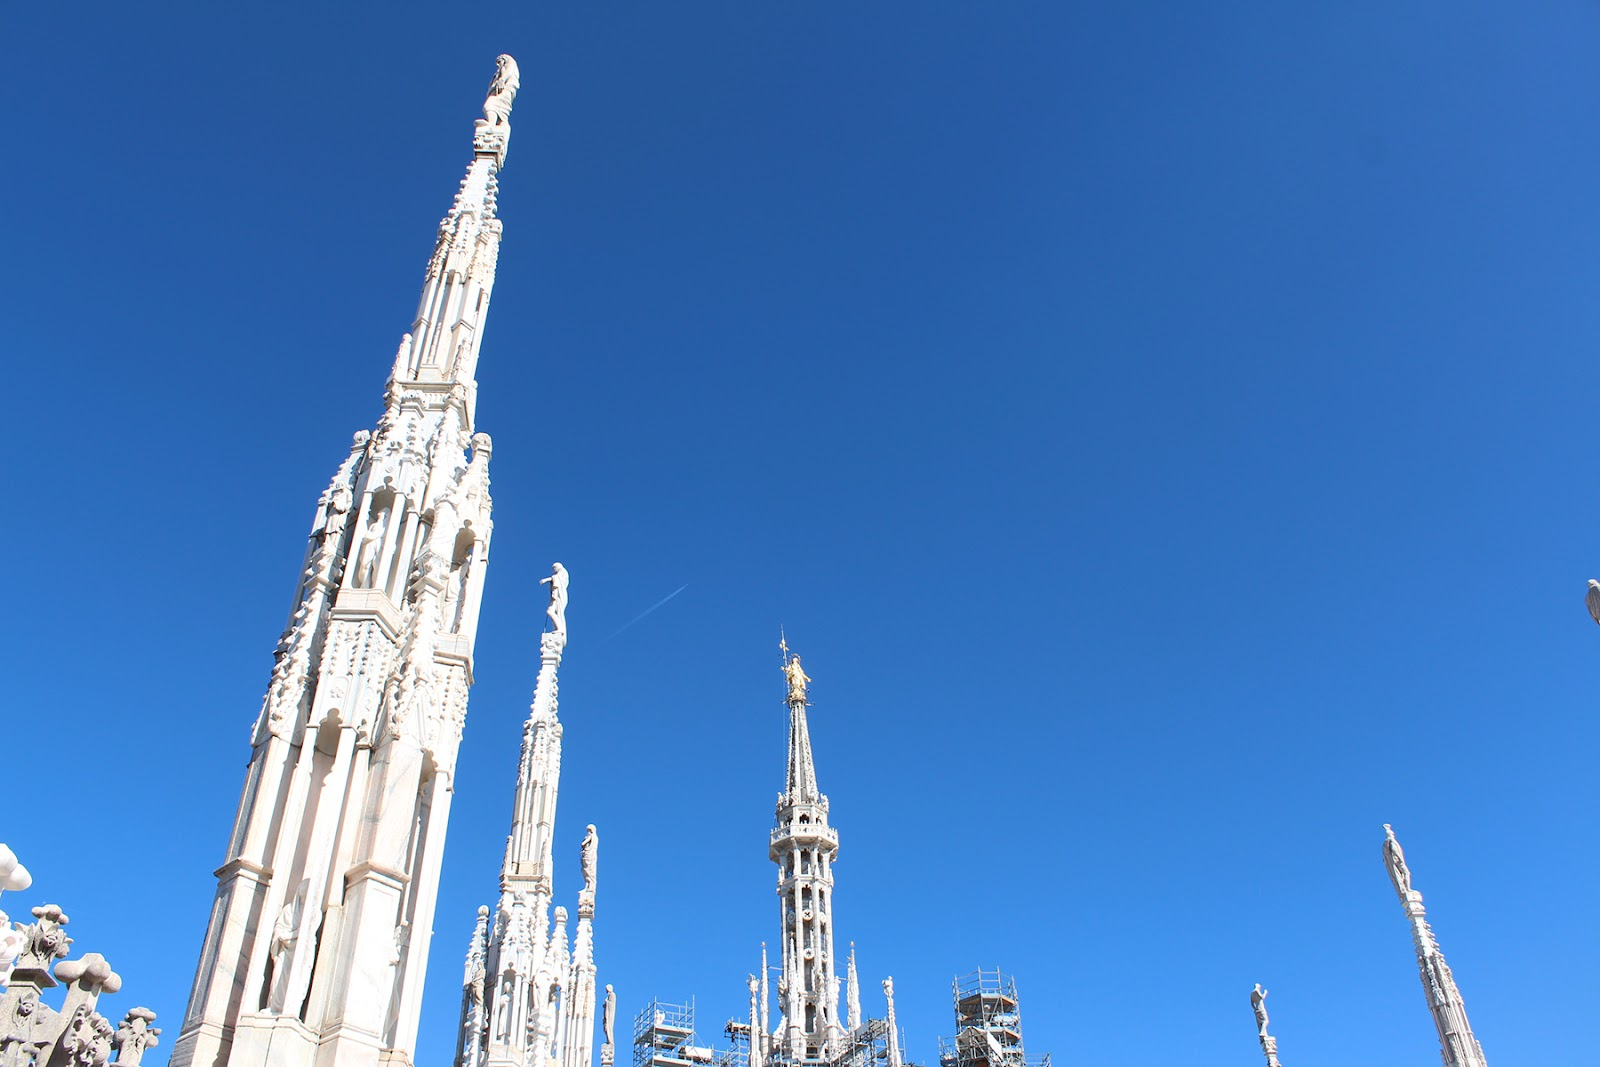 Milano duomo guglie italia italy